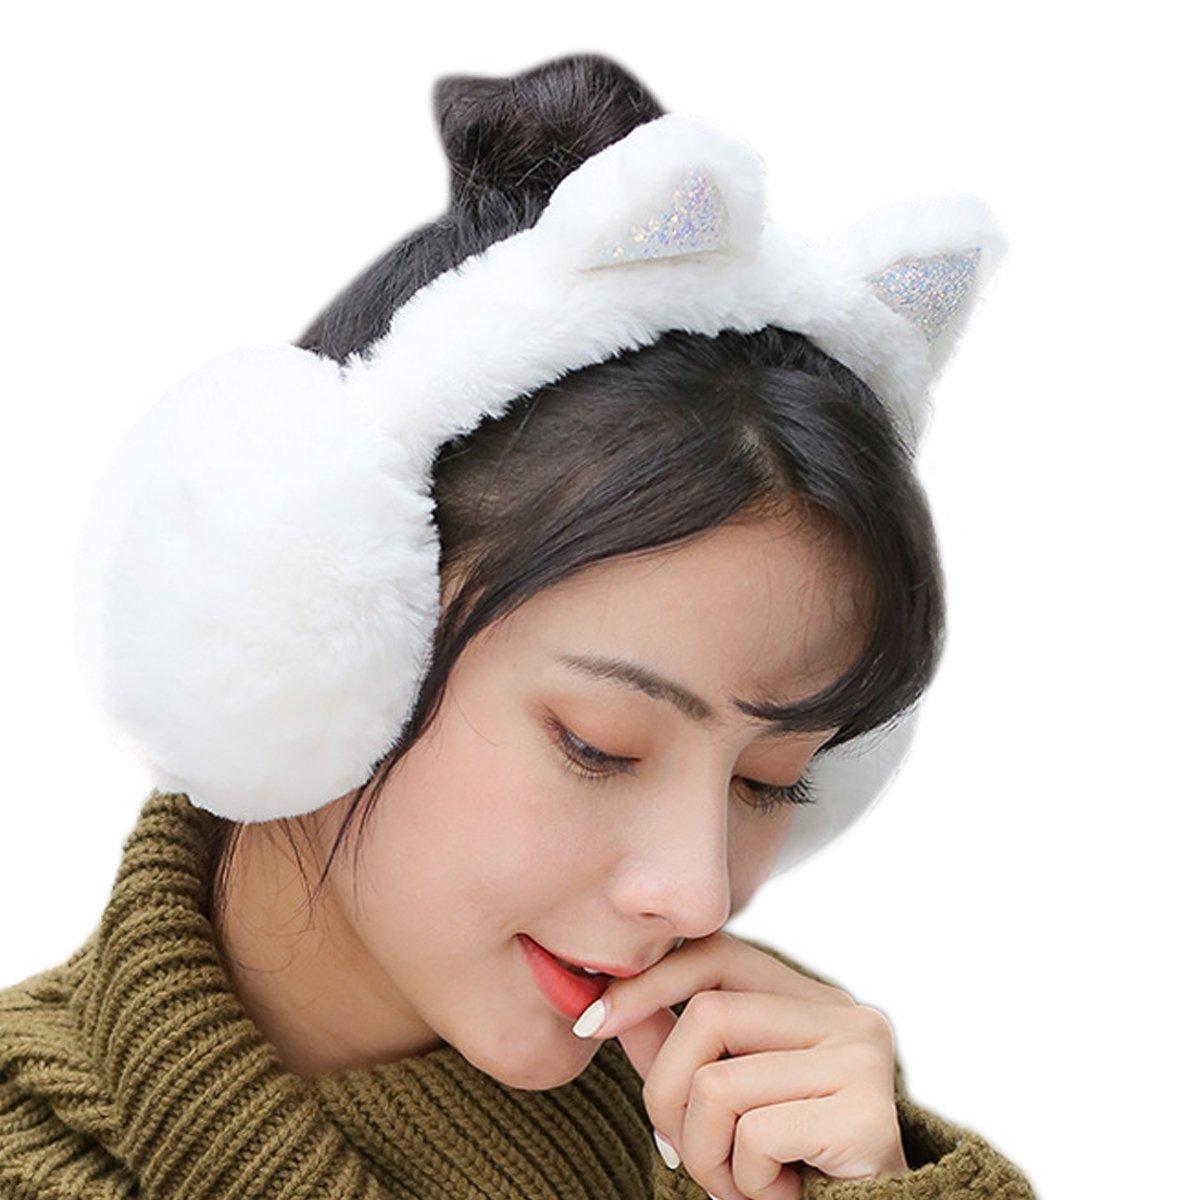 Elezay Unisex Foldable Ear Warmers Polar Winter EarMuffs Outdoor Cold Weather HSZL-EZ012-PINK